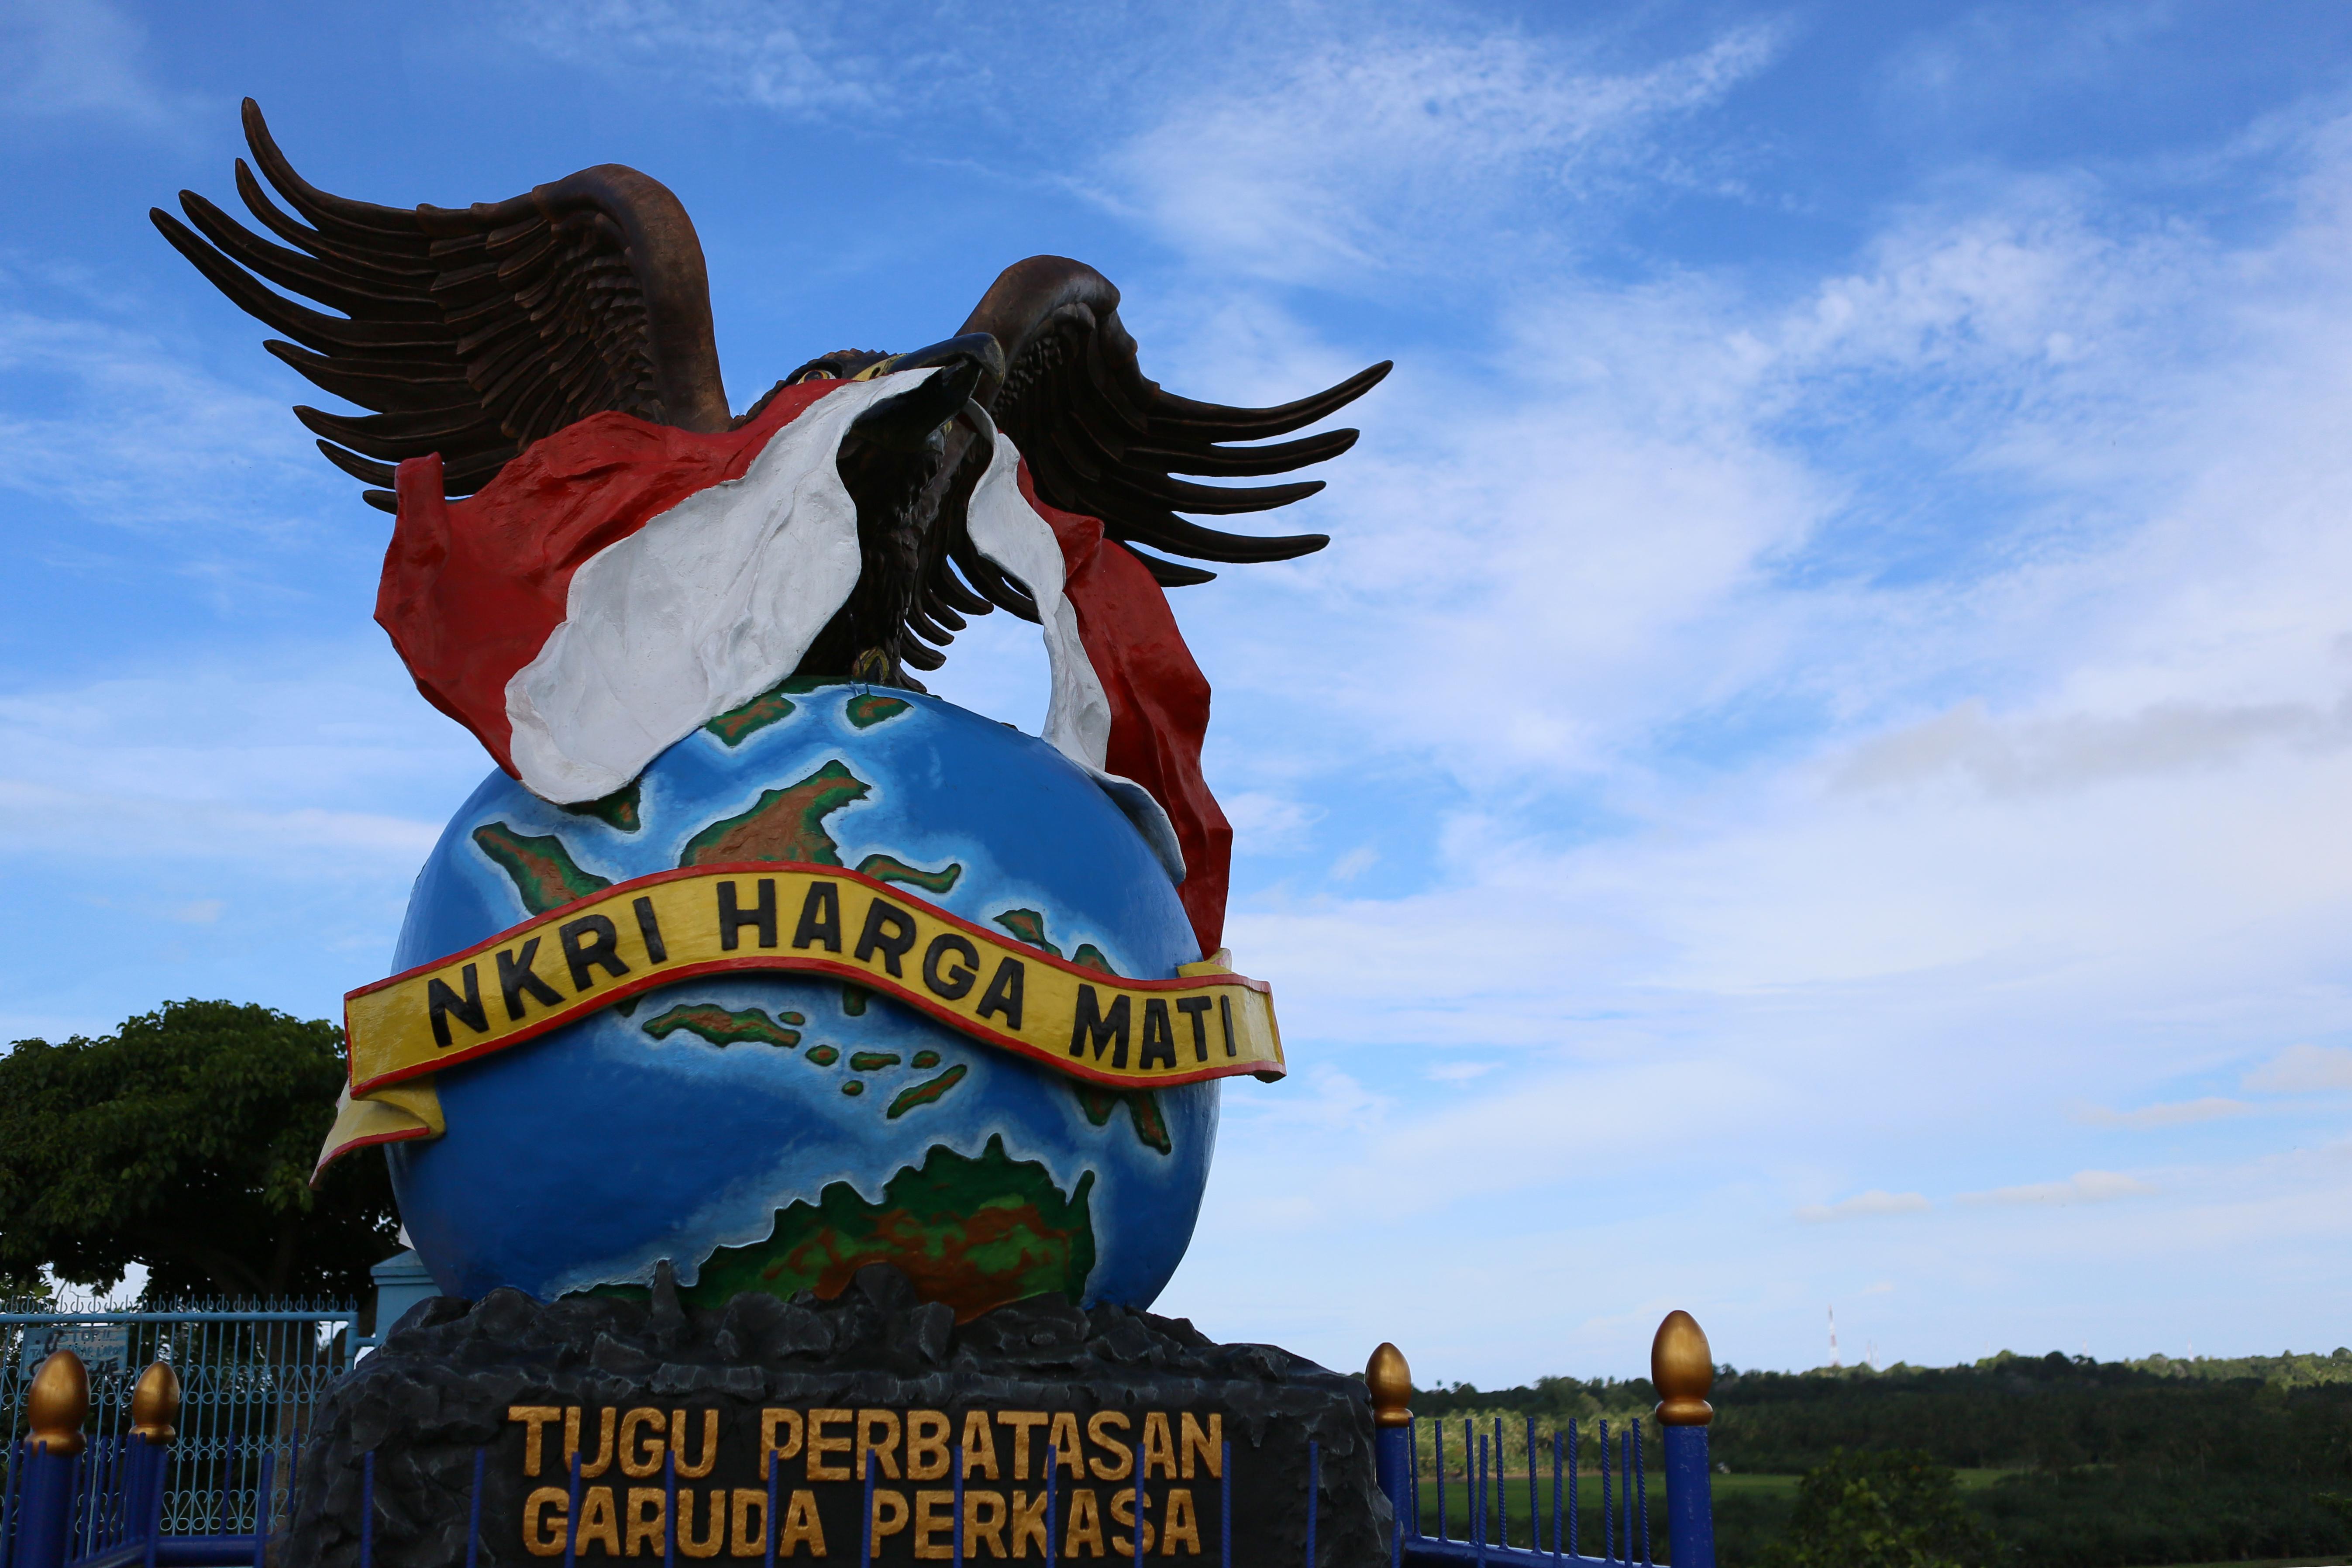 Lost Sea Archives Fromgetlost Tugu Garuda Perkasa Lokasi Aji Kuning